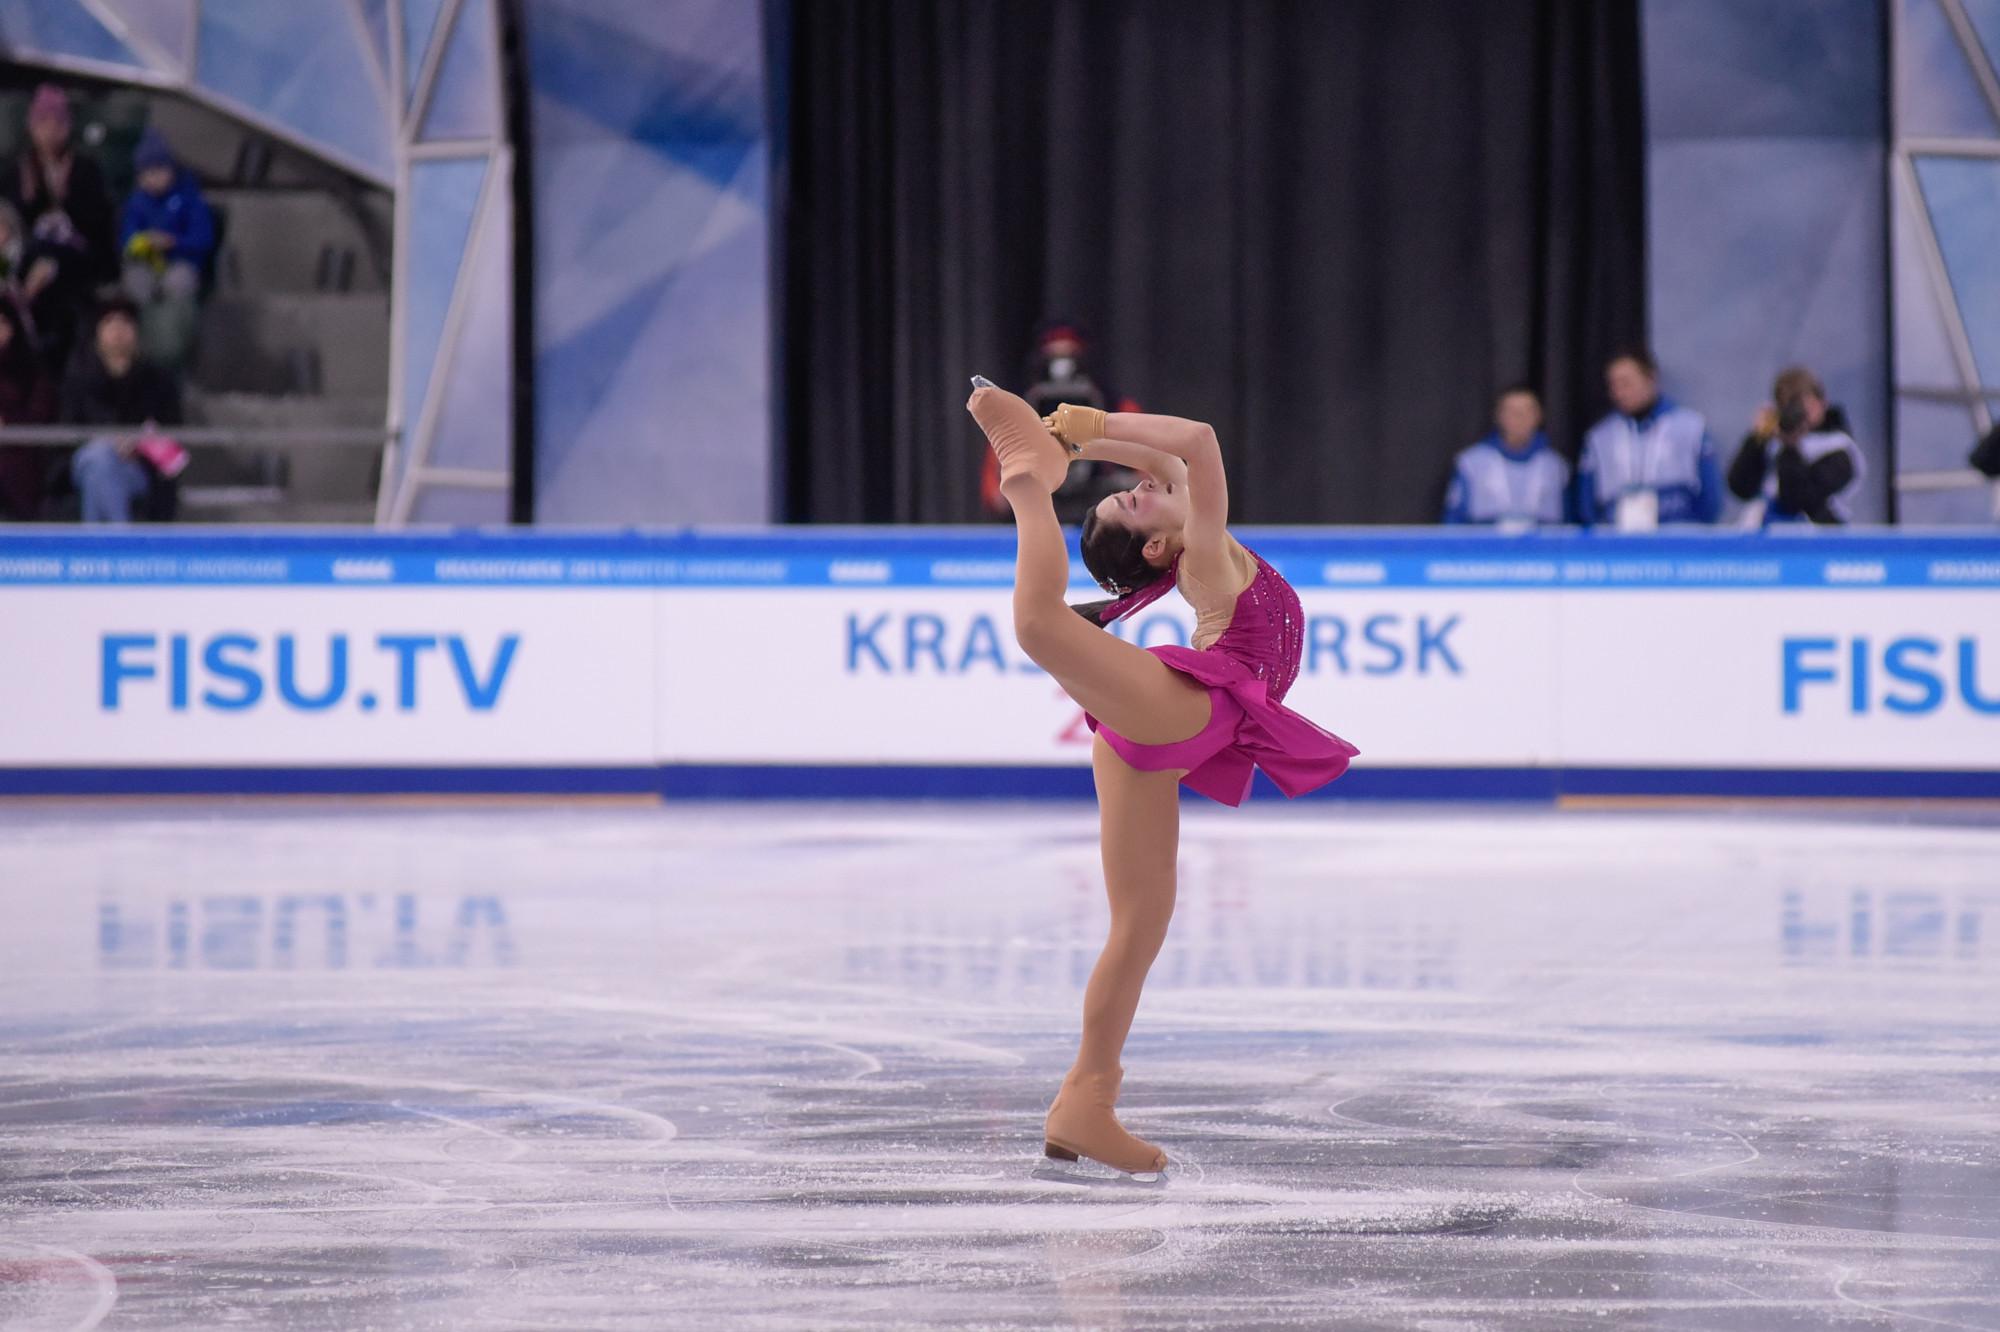 Japan's Mihara builds on lead to triumph in women's figure skating at Krasnoyarsk 2019